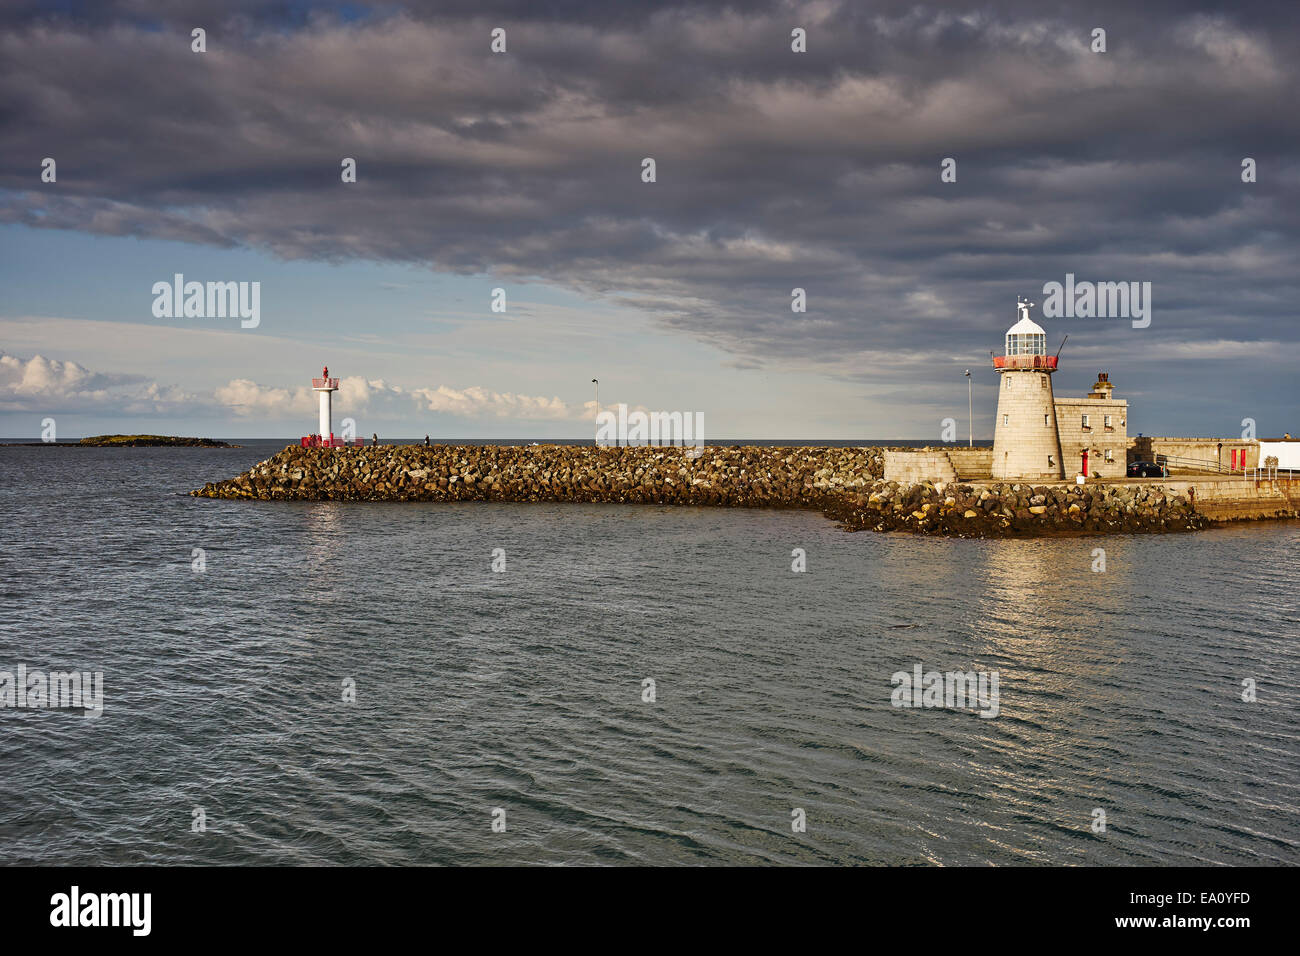 Vista del faro de Howth Howth, la Bahía de Dublín, República de Irlanda Foto de stock